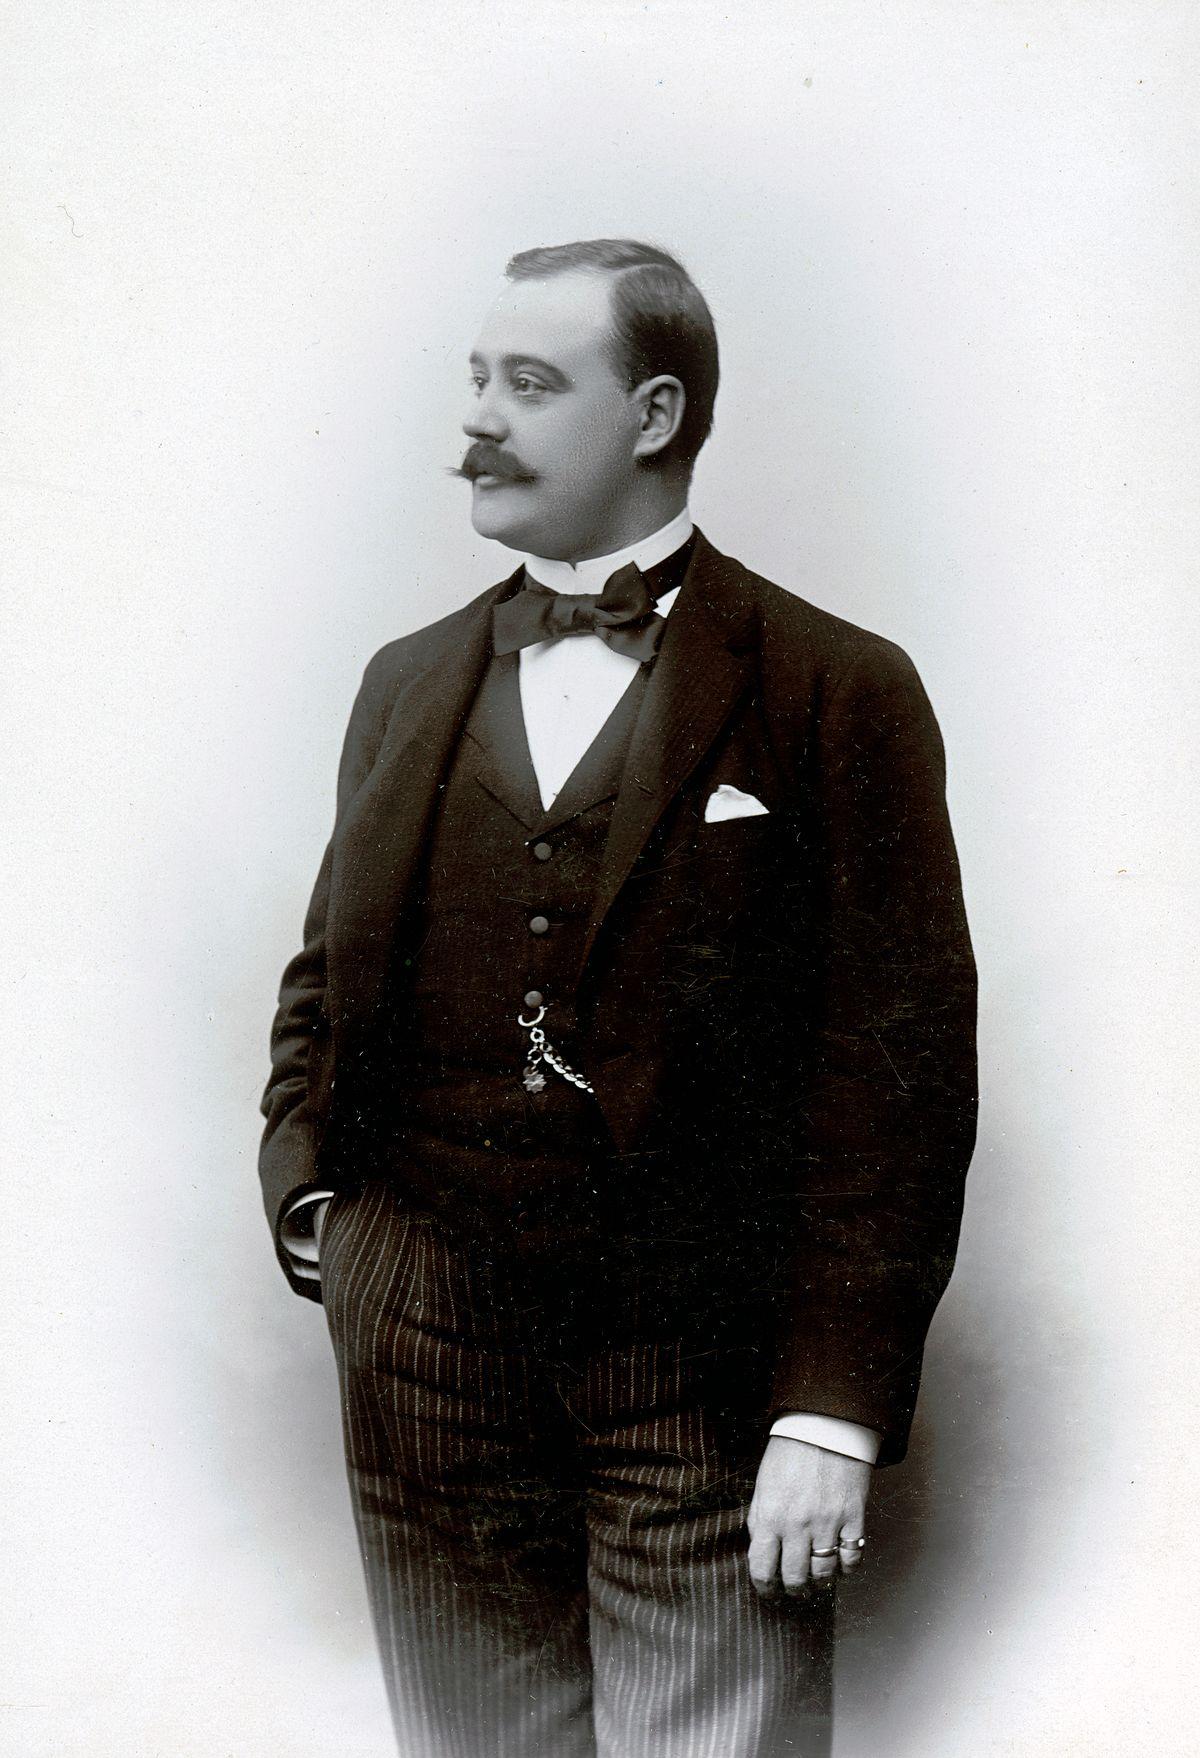 Oscar Bystrom Skadespelare Wikipedia